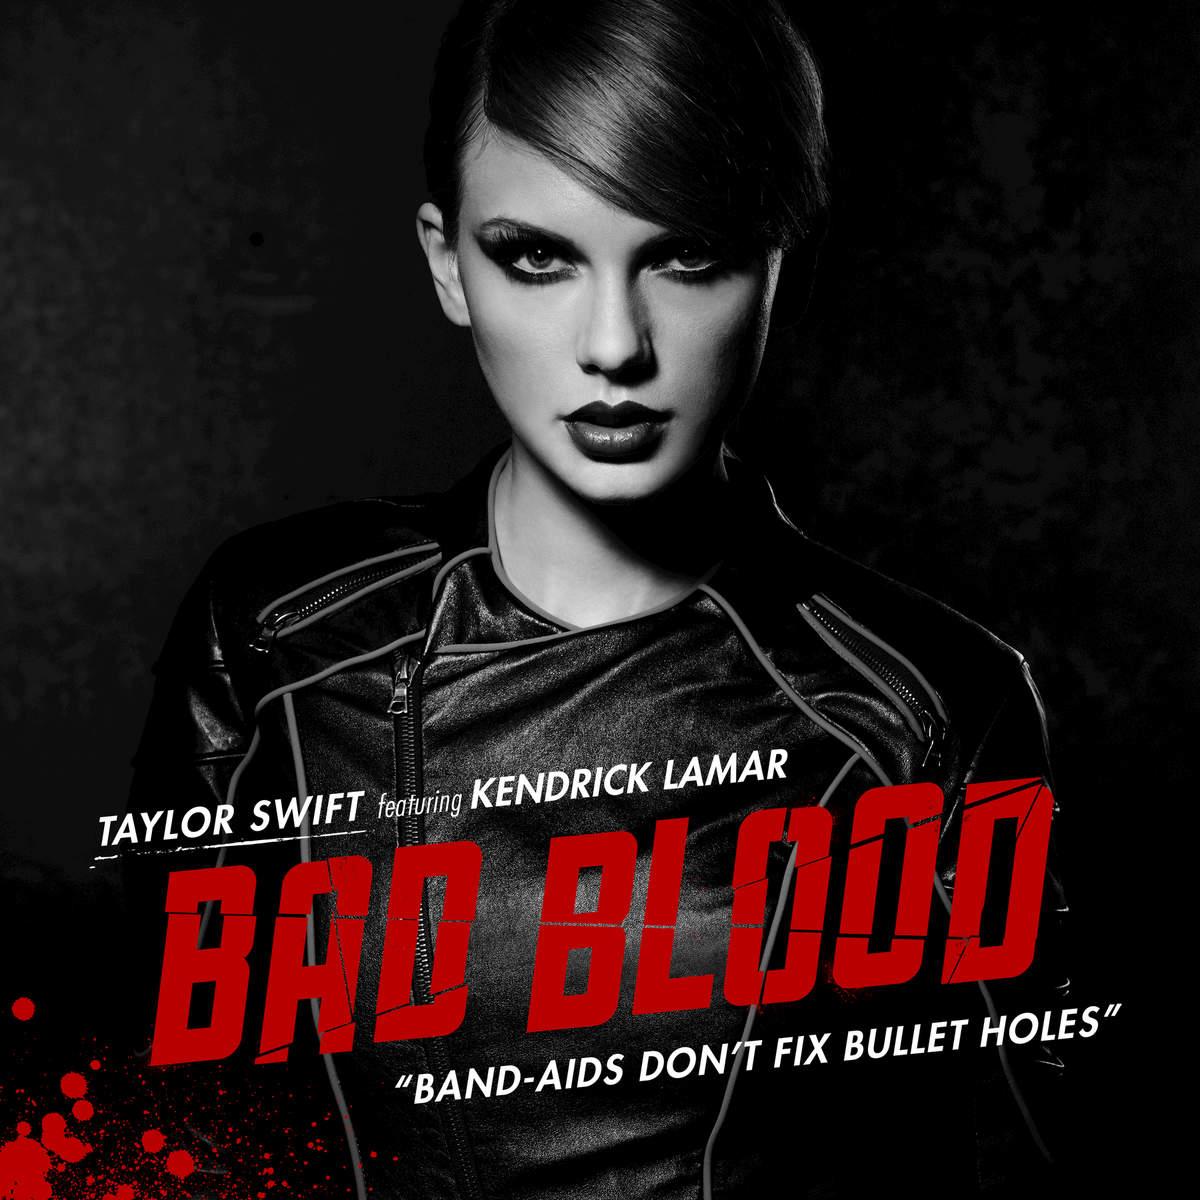 Taylor swift bad blood 2015 remix 1200x1200